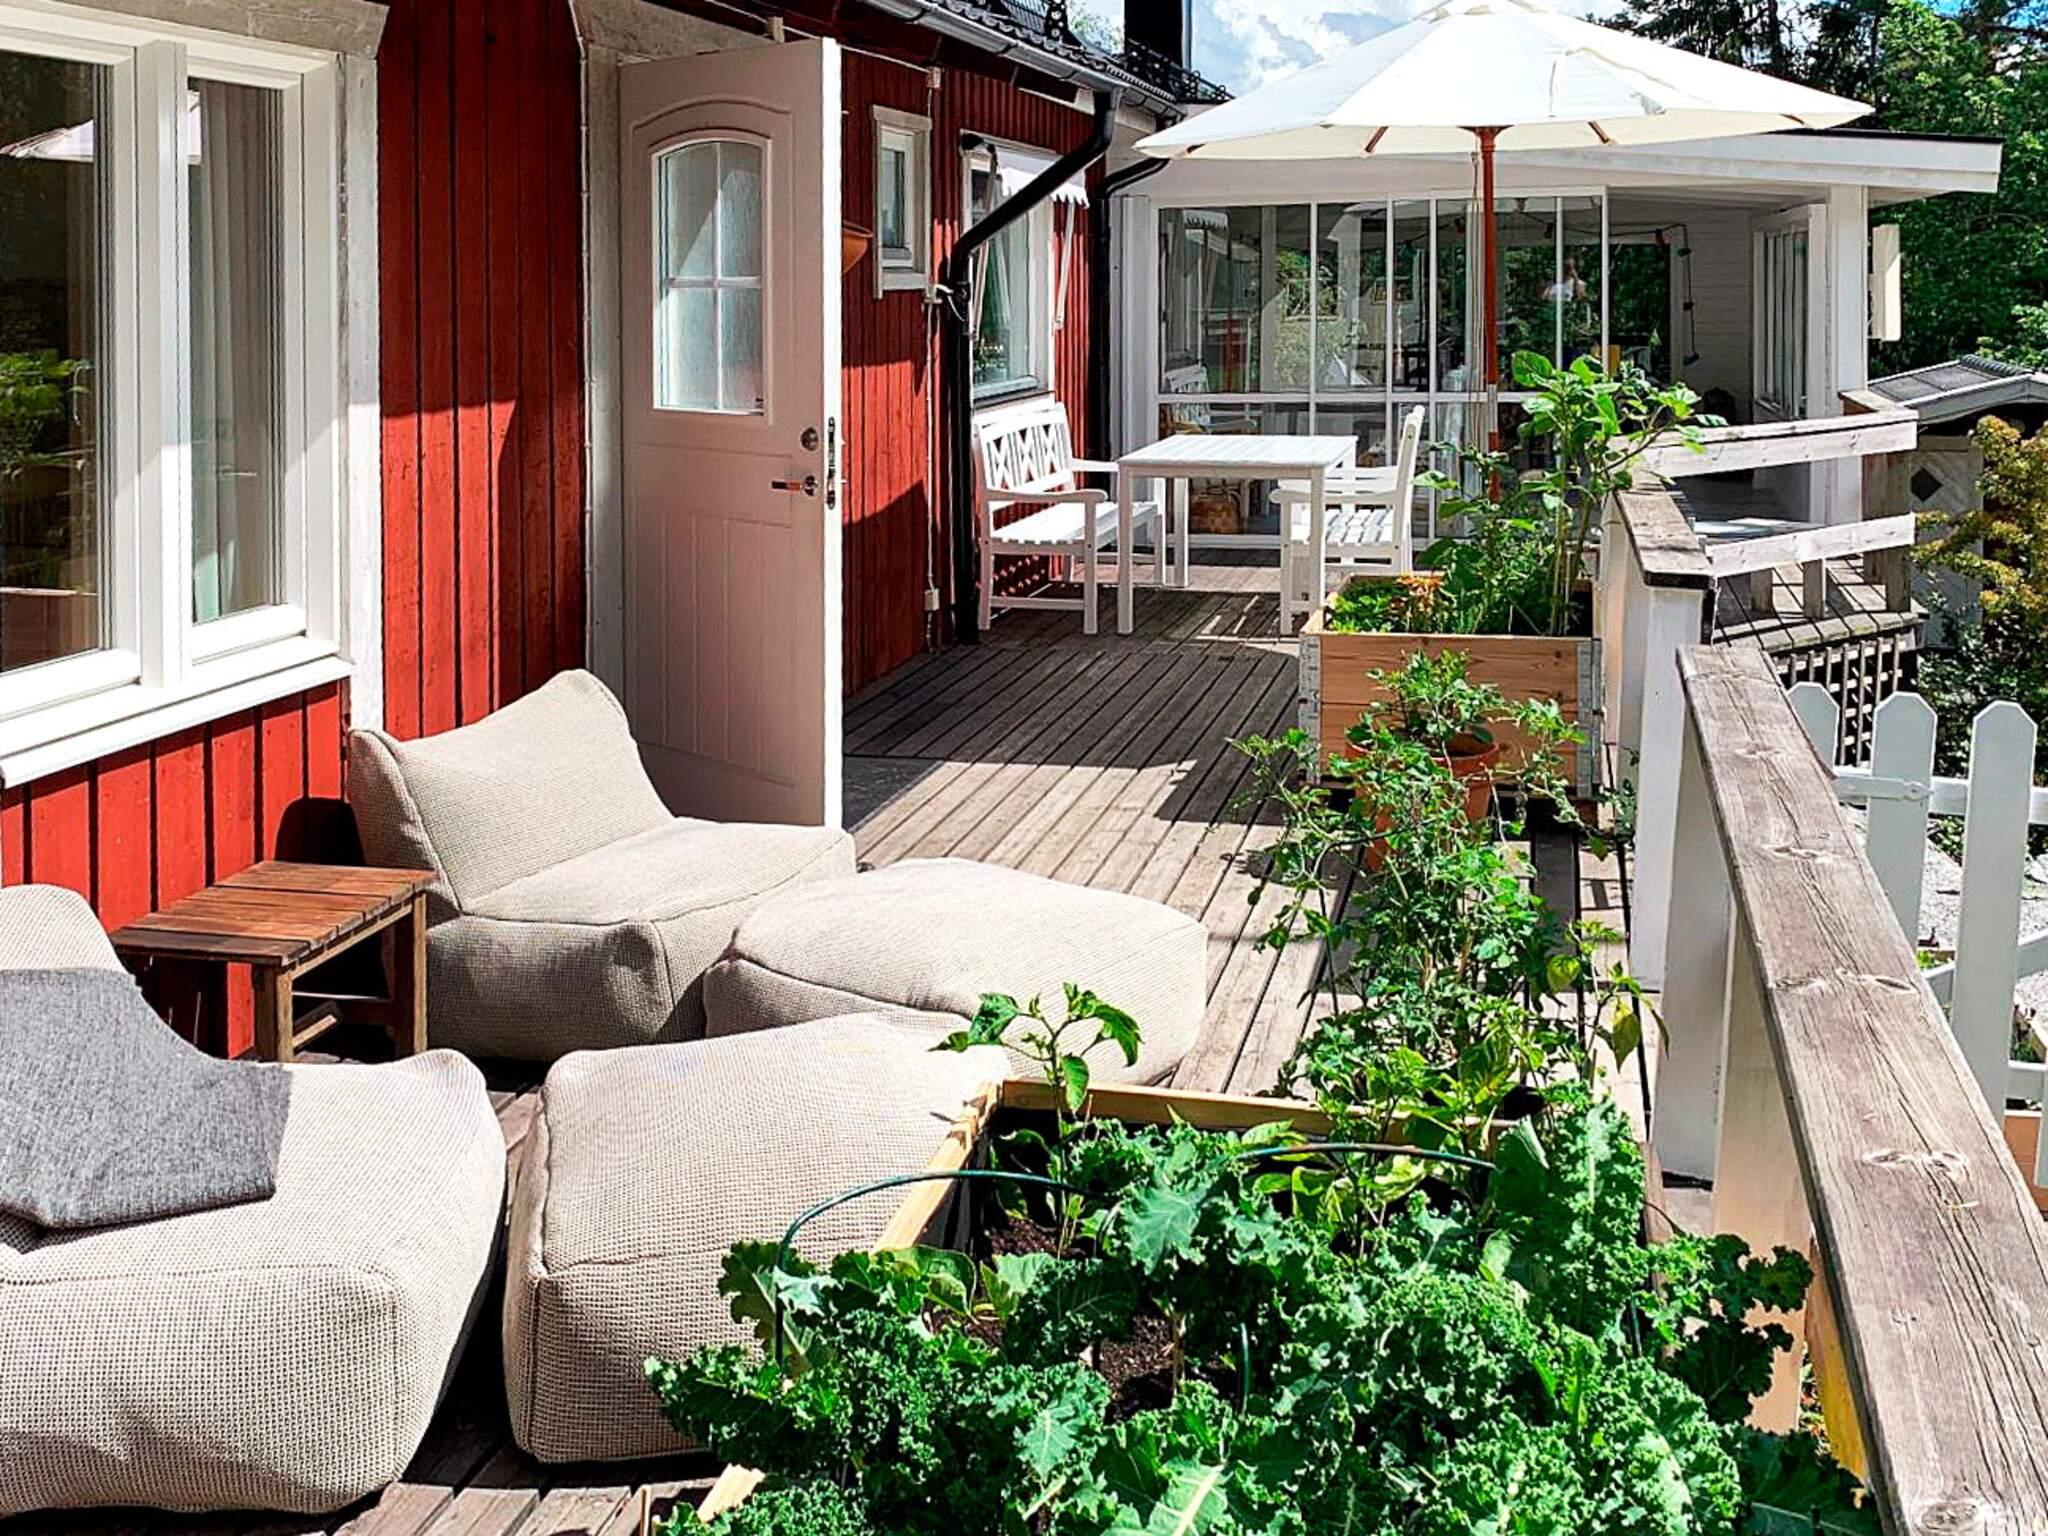 Ferienhaus Värmdö (2633225), Värmdö, Region Stockholm, Mittelschweden, Schweden, Bild 1